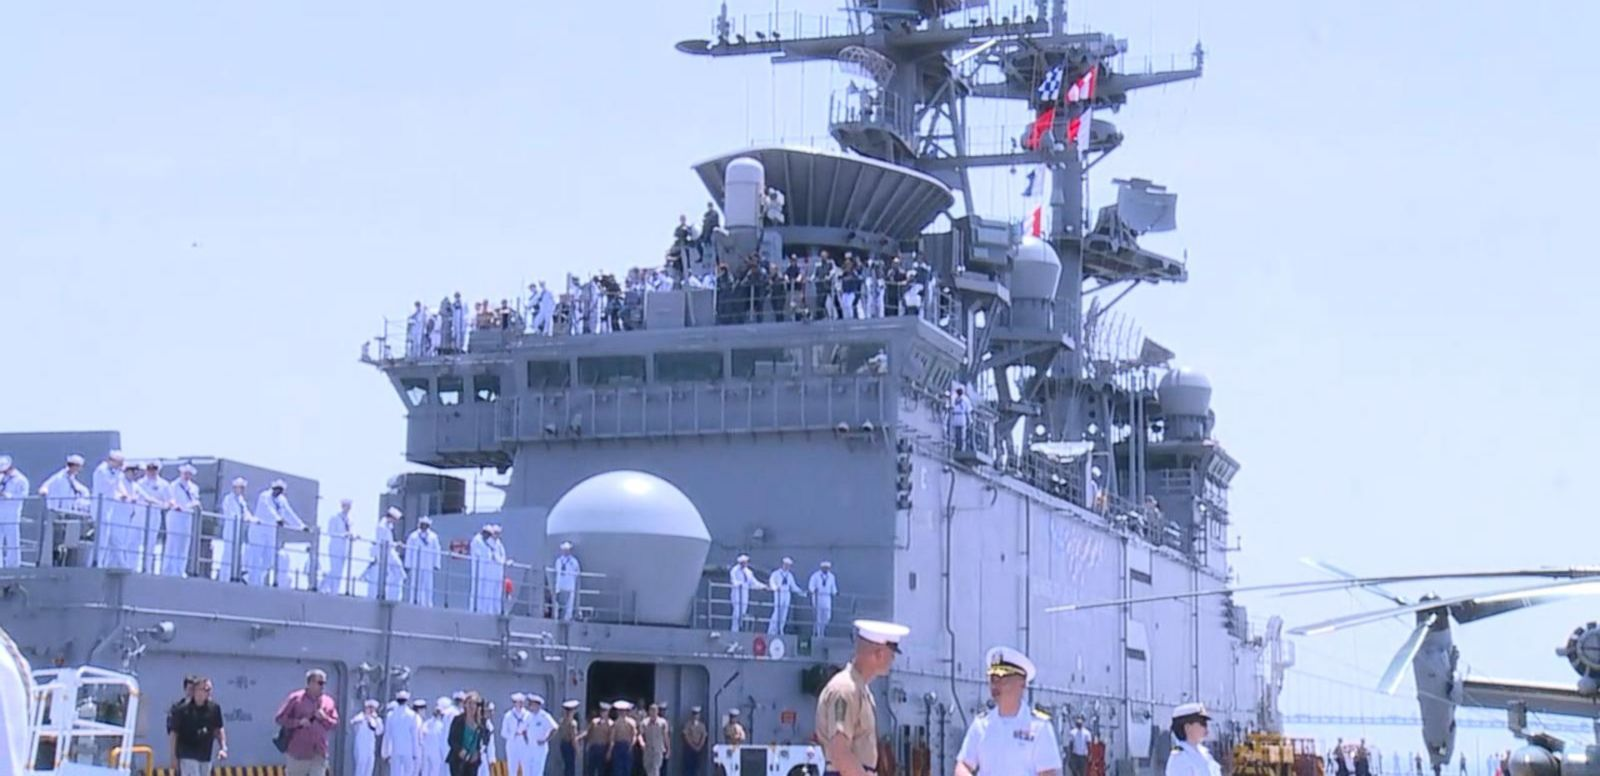 VIDEO: Sail Along as the USS Bataan Arrives in New York Harbor for Fleet Week